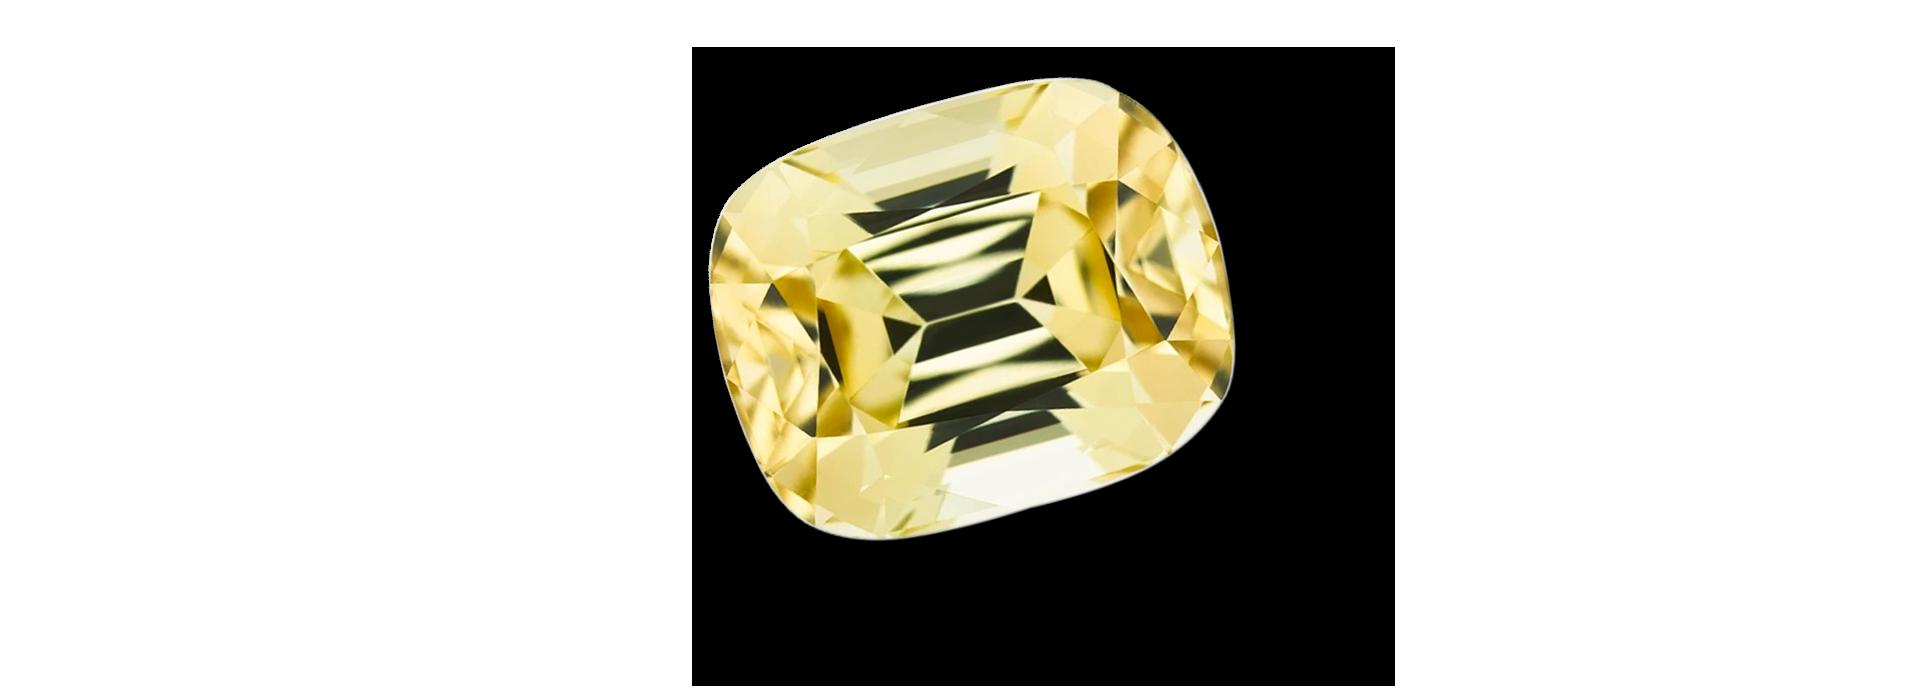 pierre tourmaline jaune